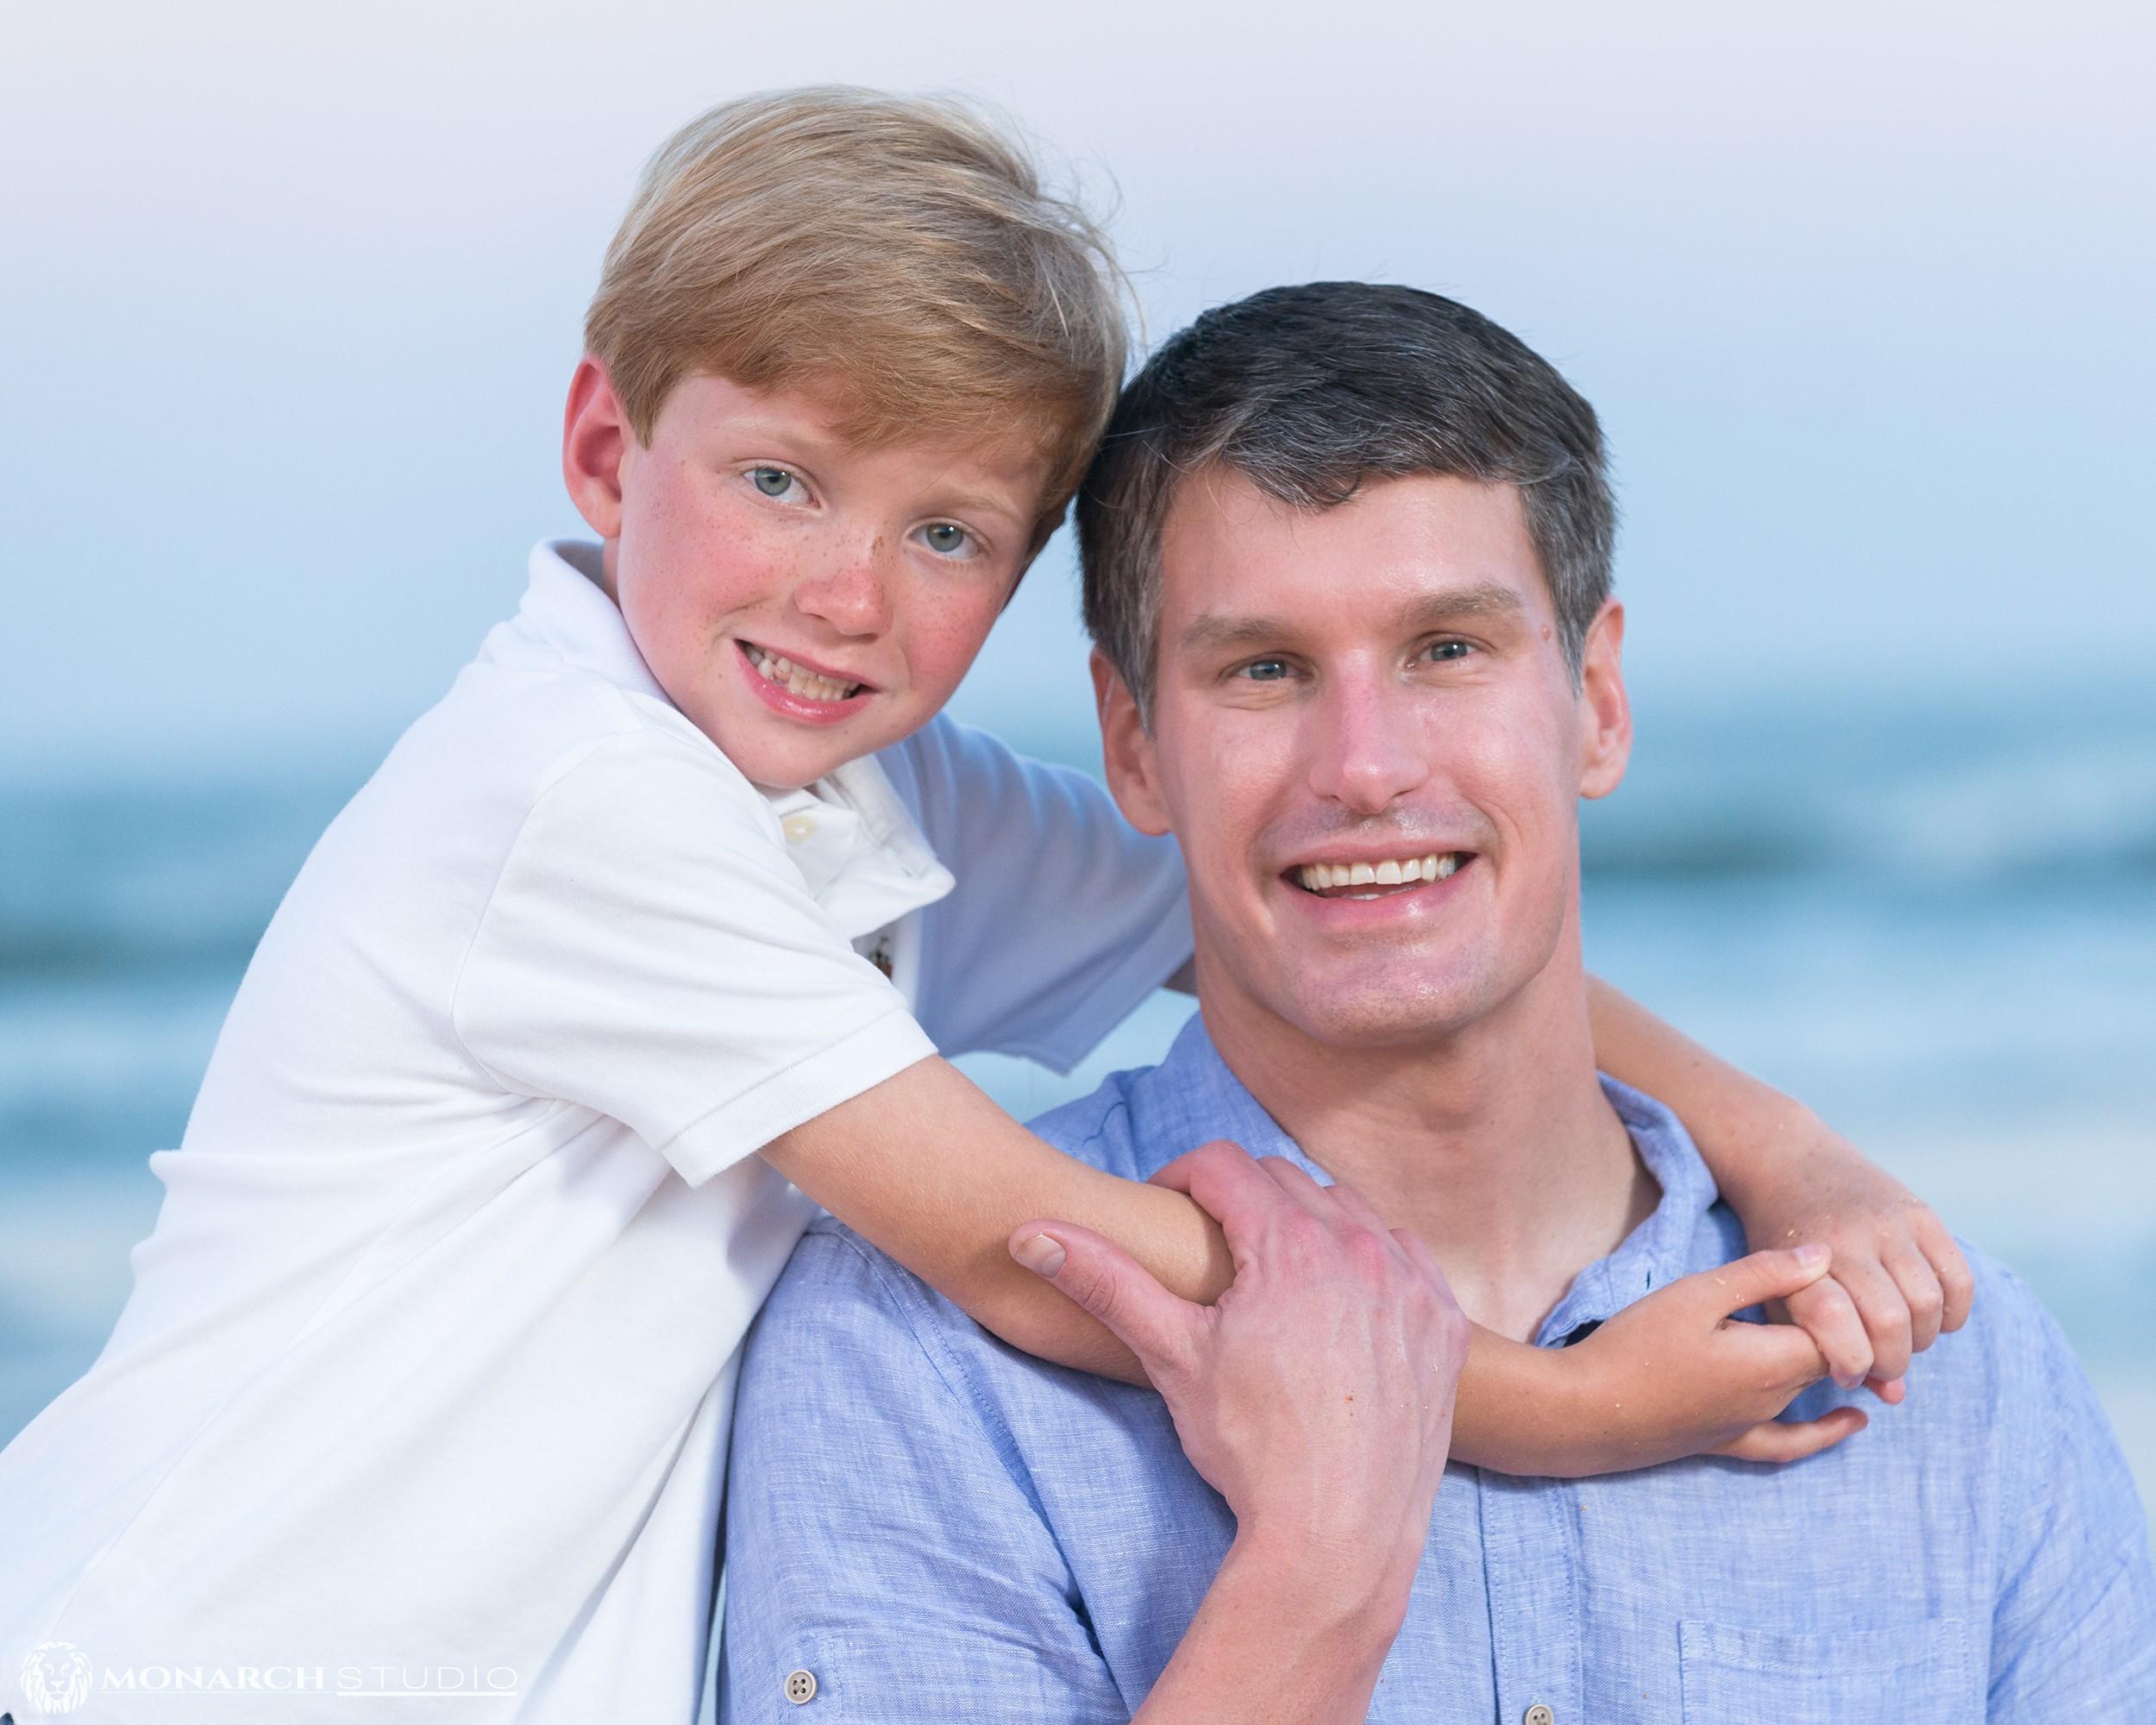 St-Augustine-Beach-Family-Portrait-Photographer_0020.jpg